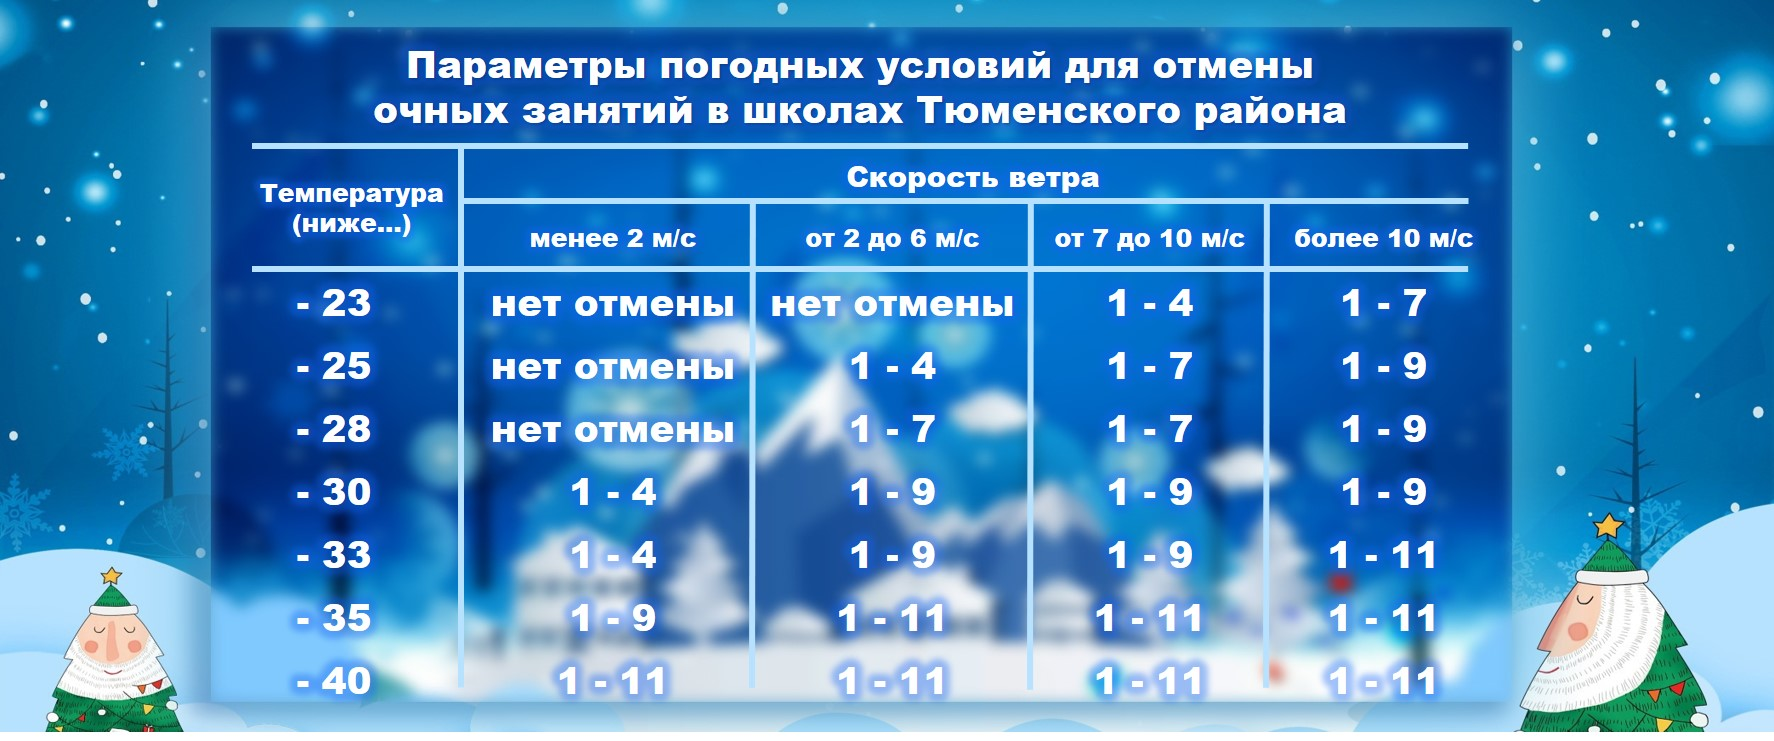 Actirovki_c01-03-2021